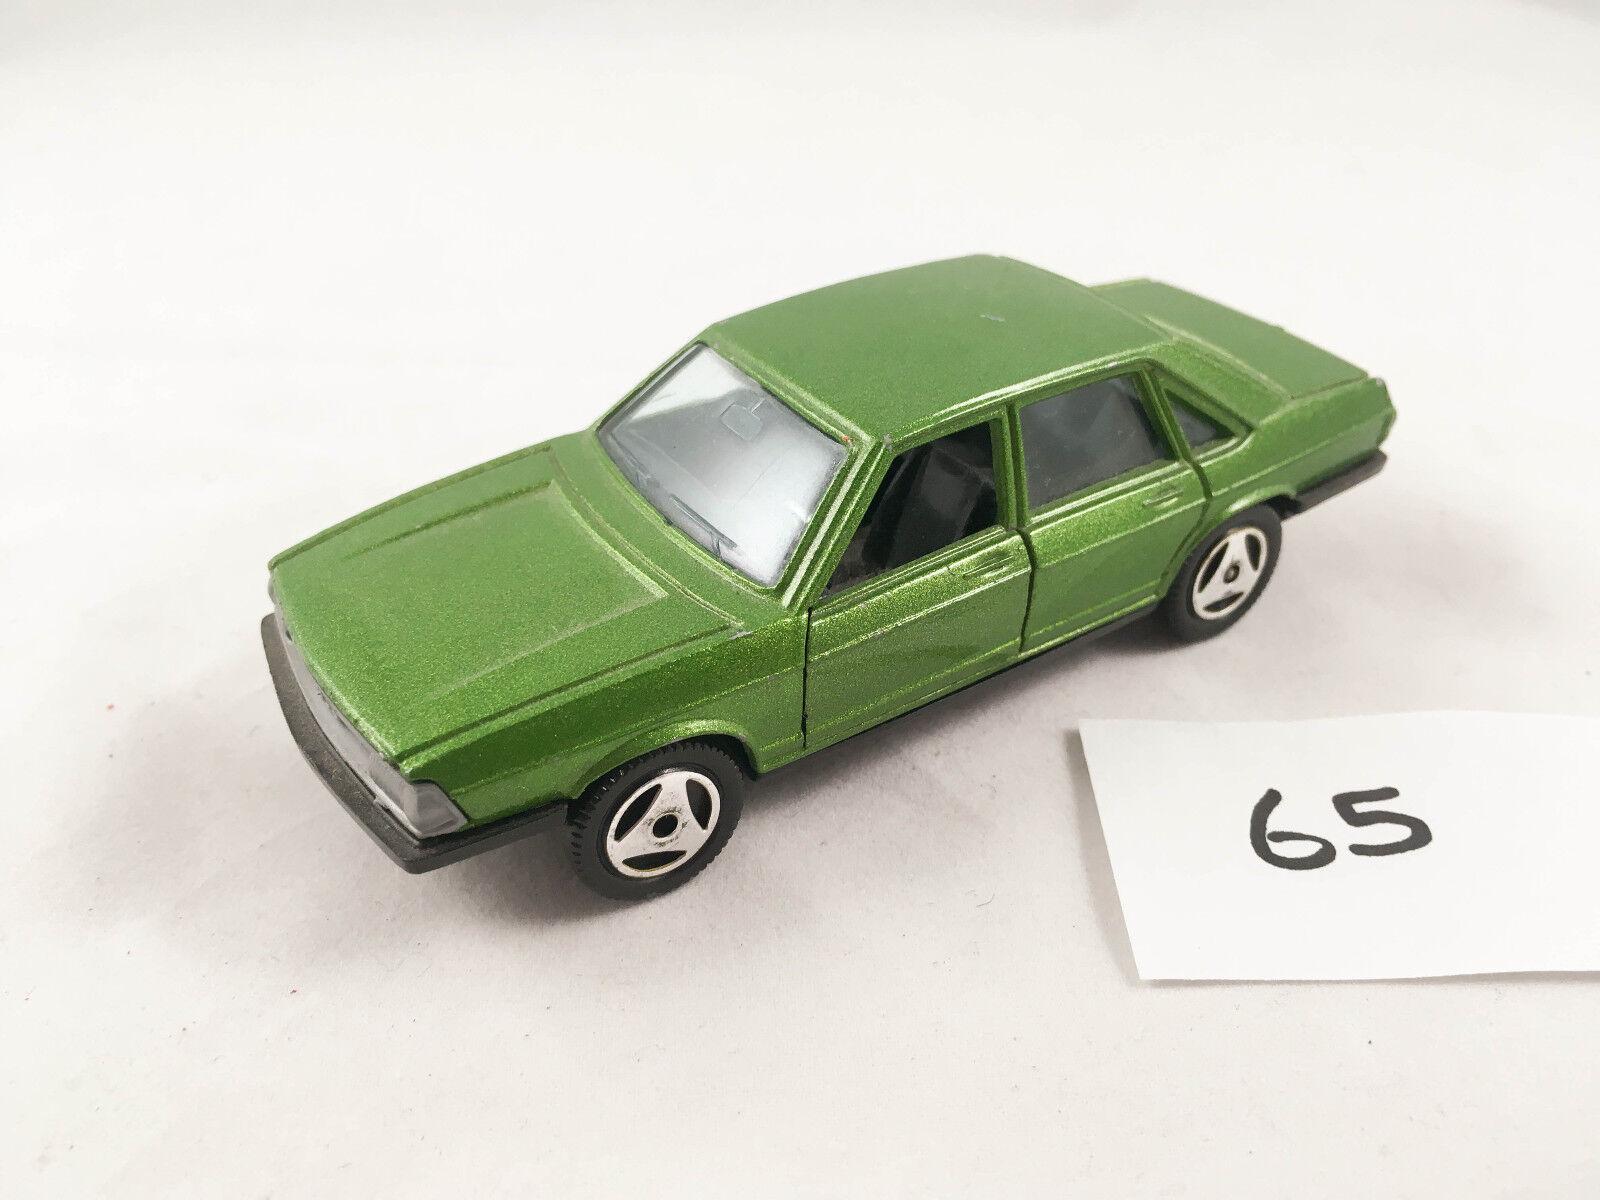 RARE Vintage HOT WHEELS MEBETOYS SB   A118 AUDI 100 verde Diecast Auto Giocattolo